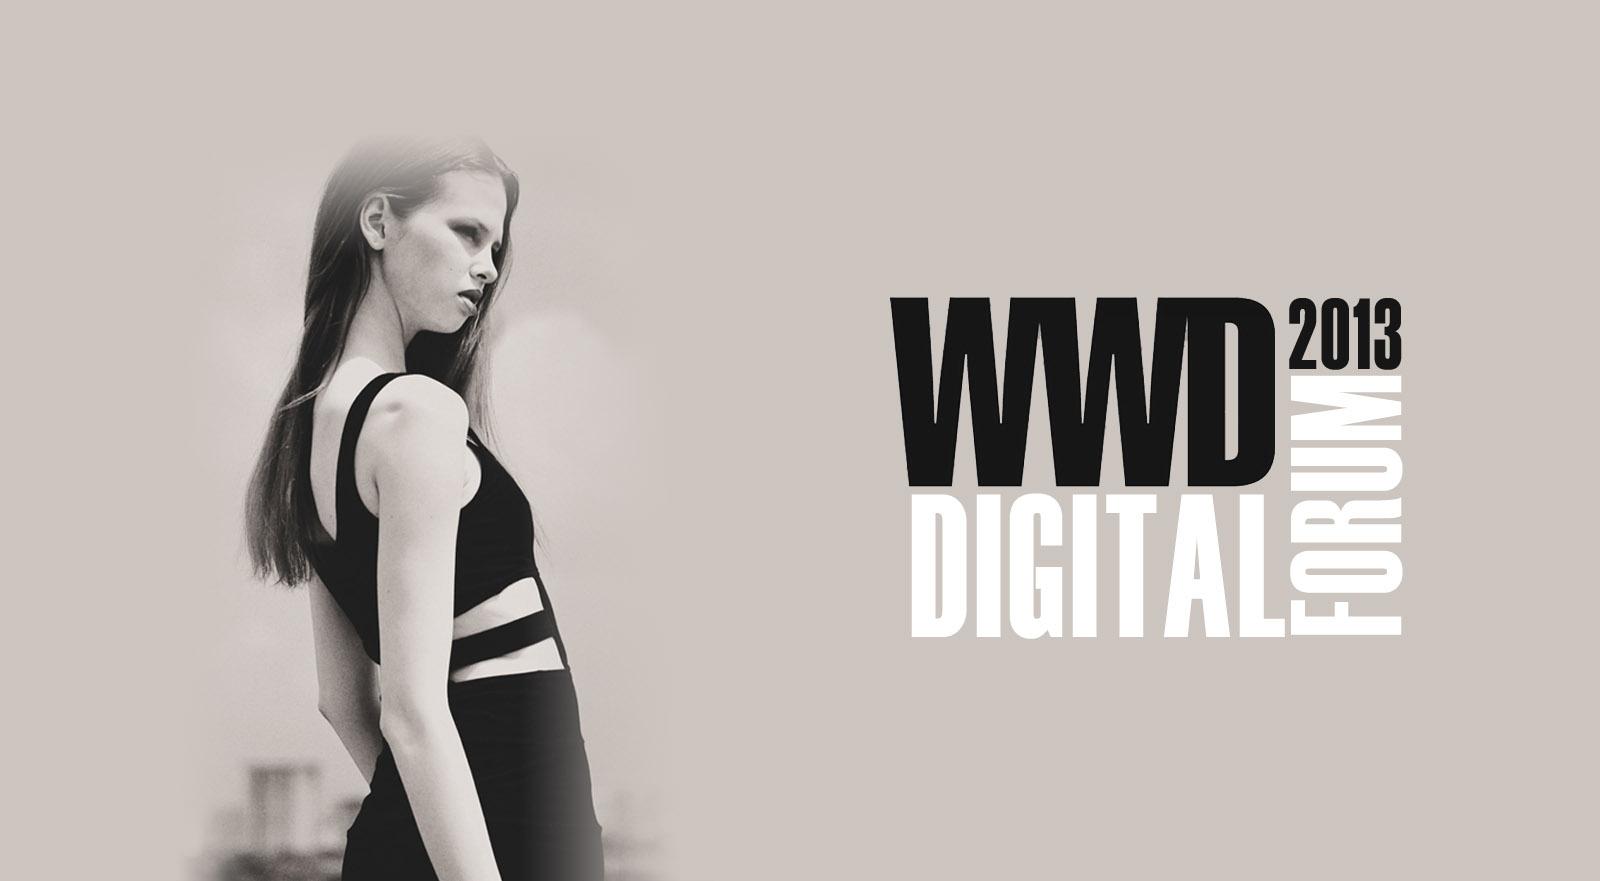 Corra Sponsors the 2013 WWD Digital Forum Fall Session